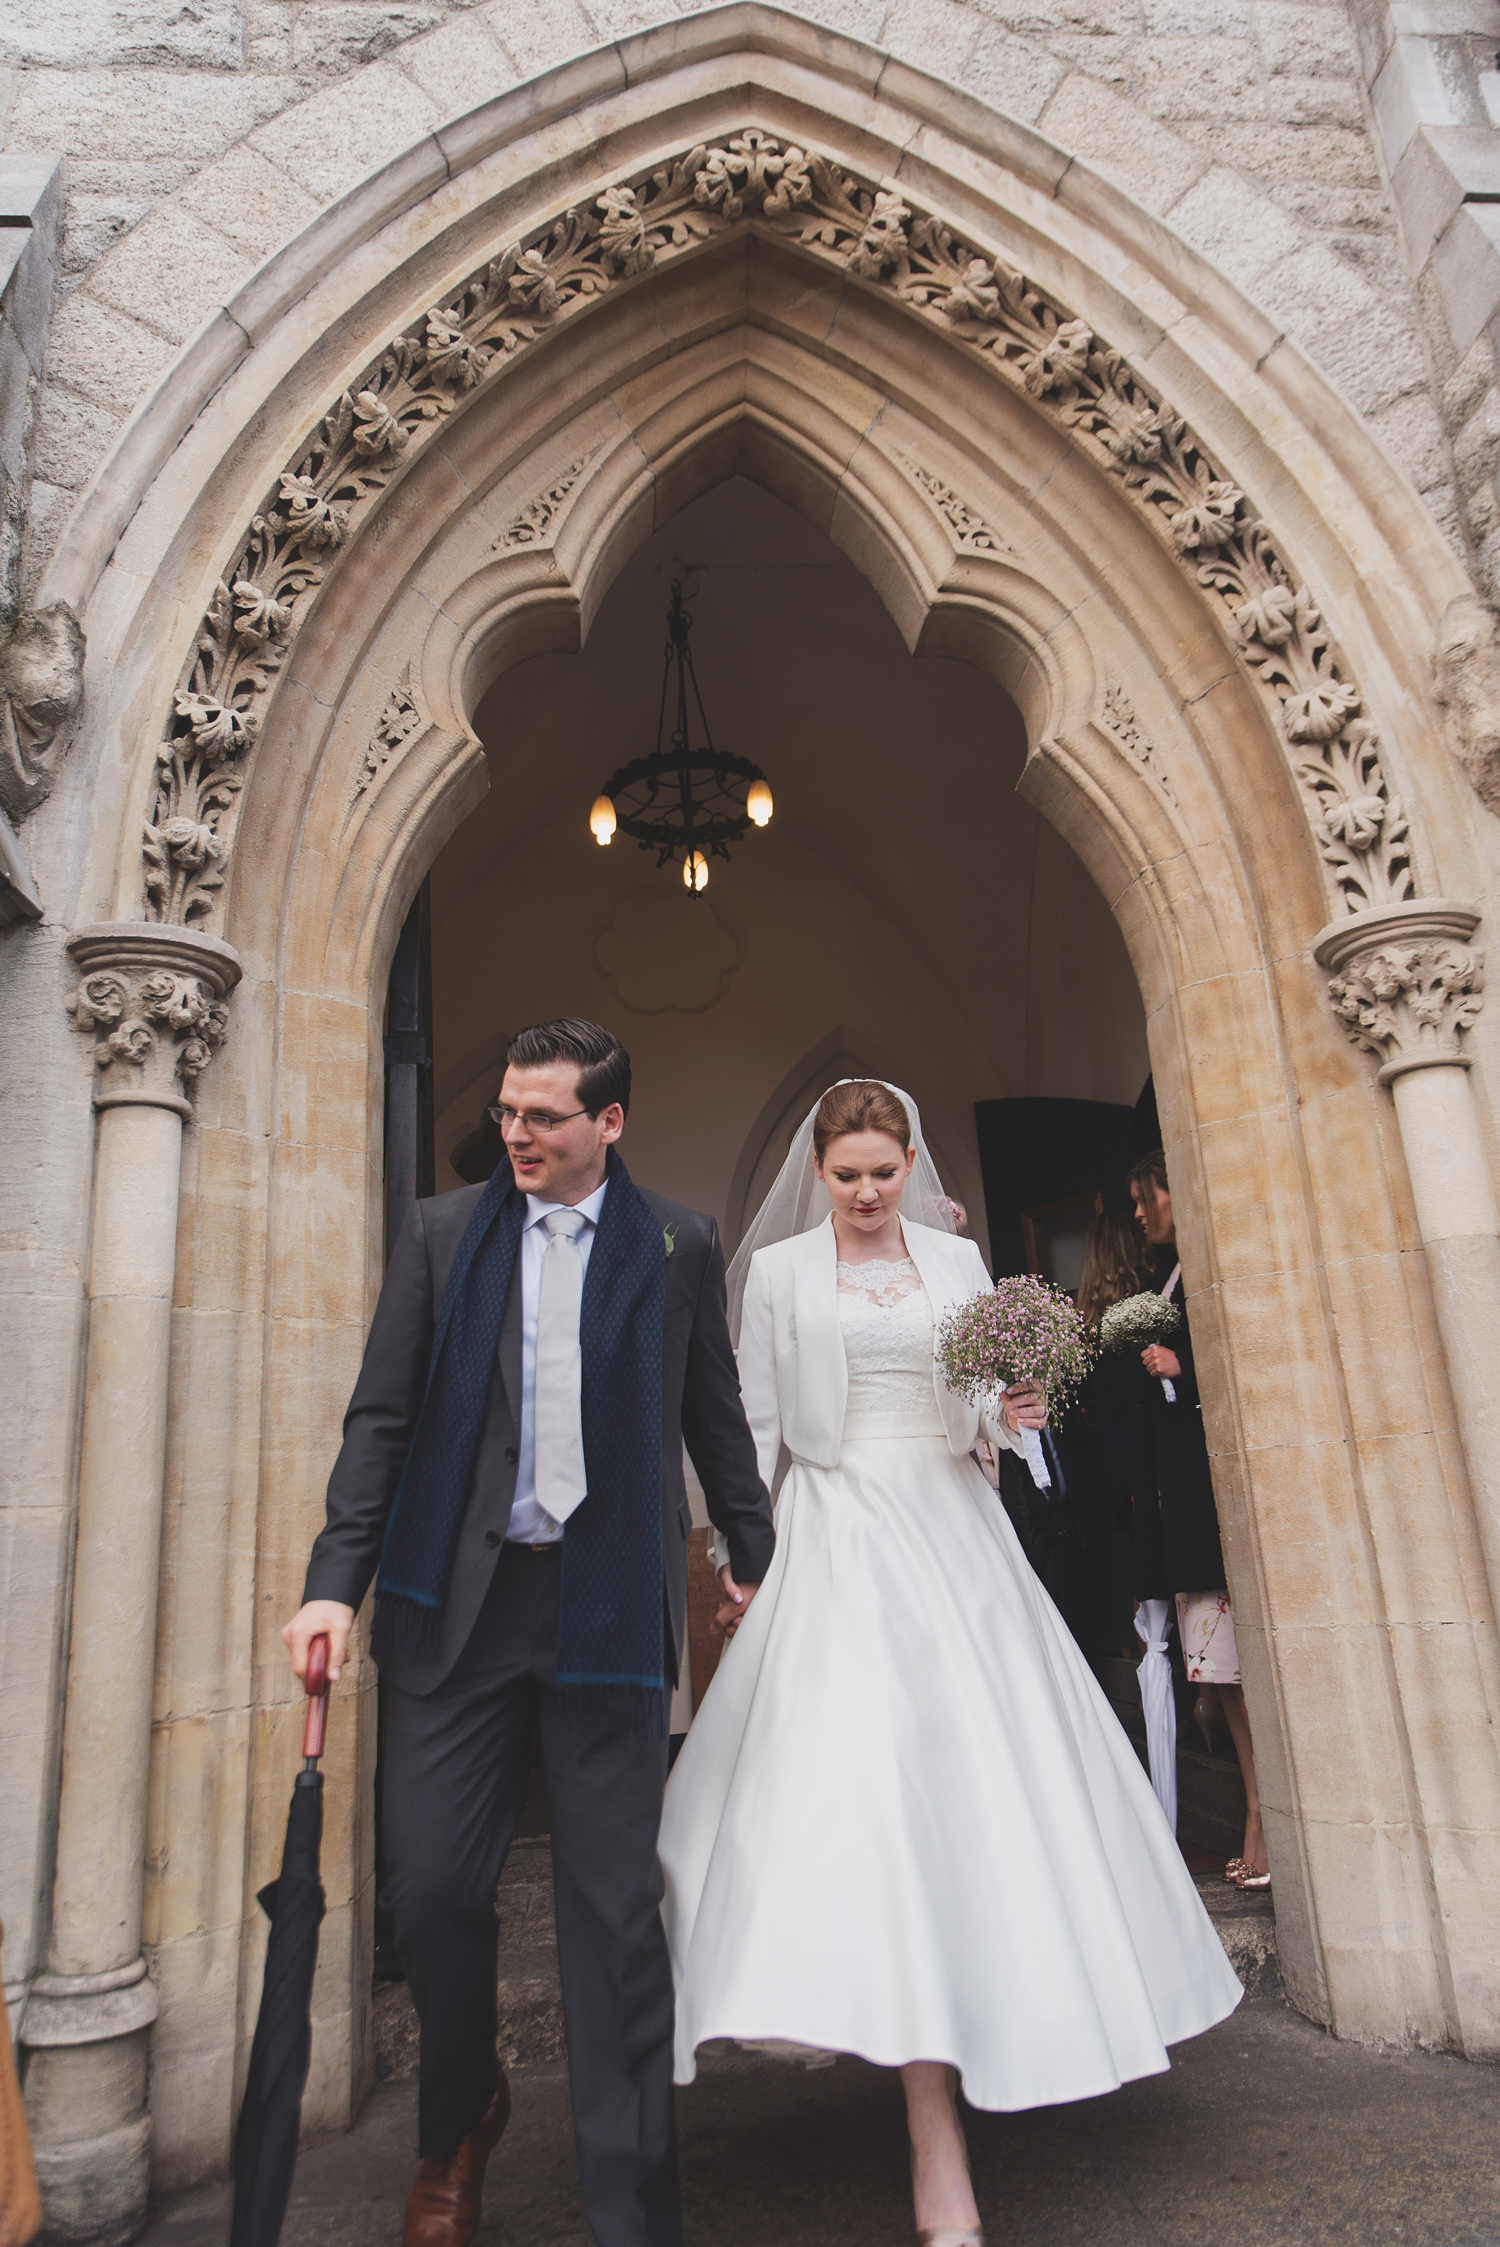 Wedding-in-Dublin-City-Centre-Morrison-Hotel-Wedding-Photography-Dublin-Stylish-City-Wedding234.jpg